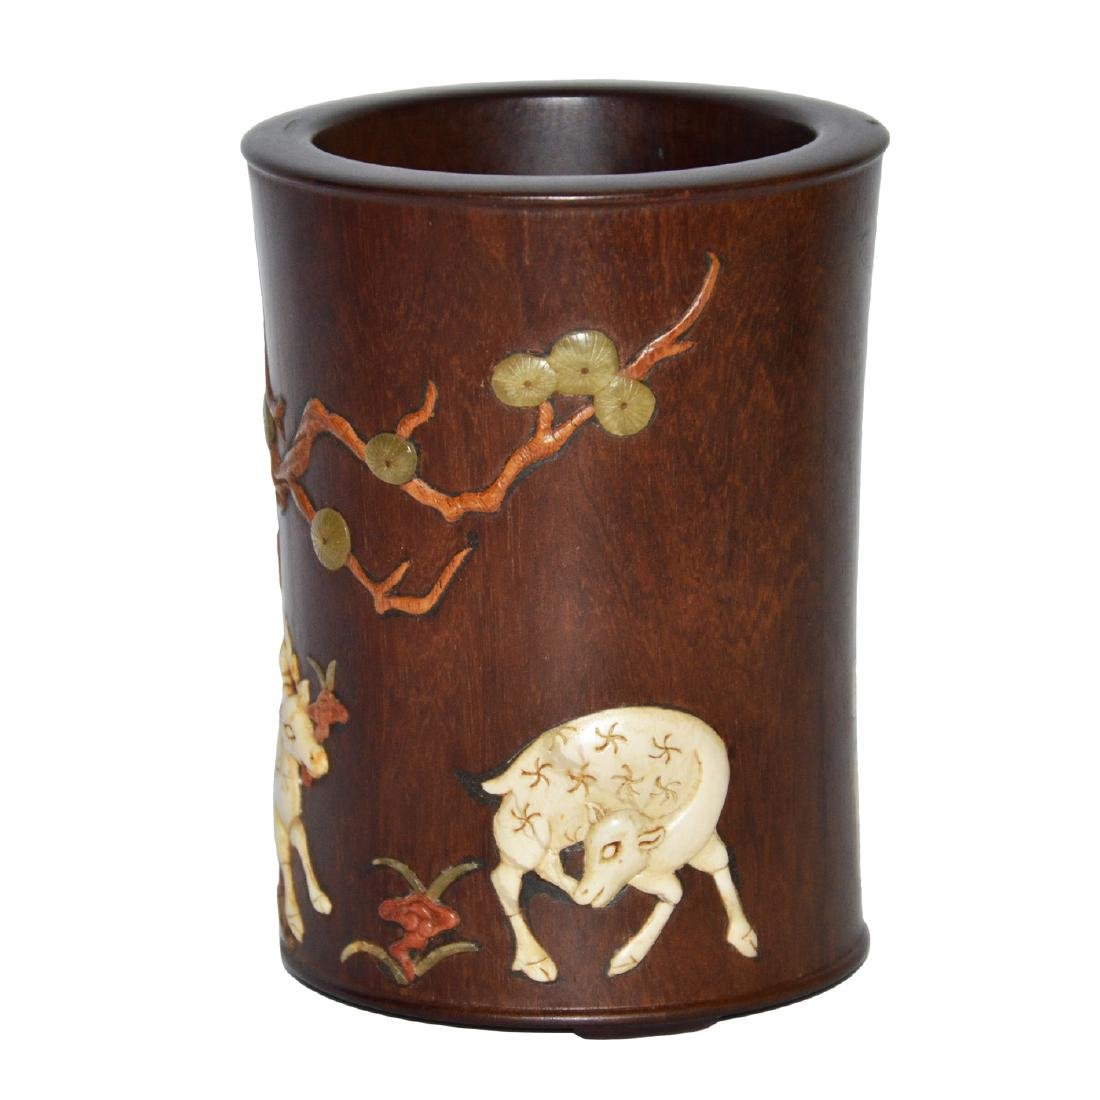 Huanghuali Brush Pot Embellished with Deer and Lingzhi - 2